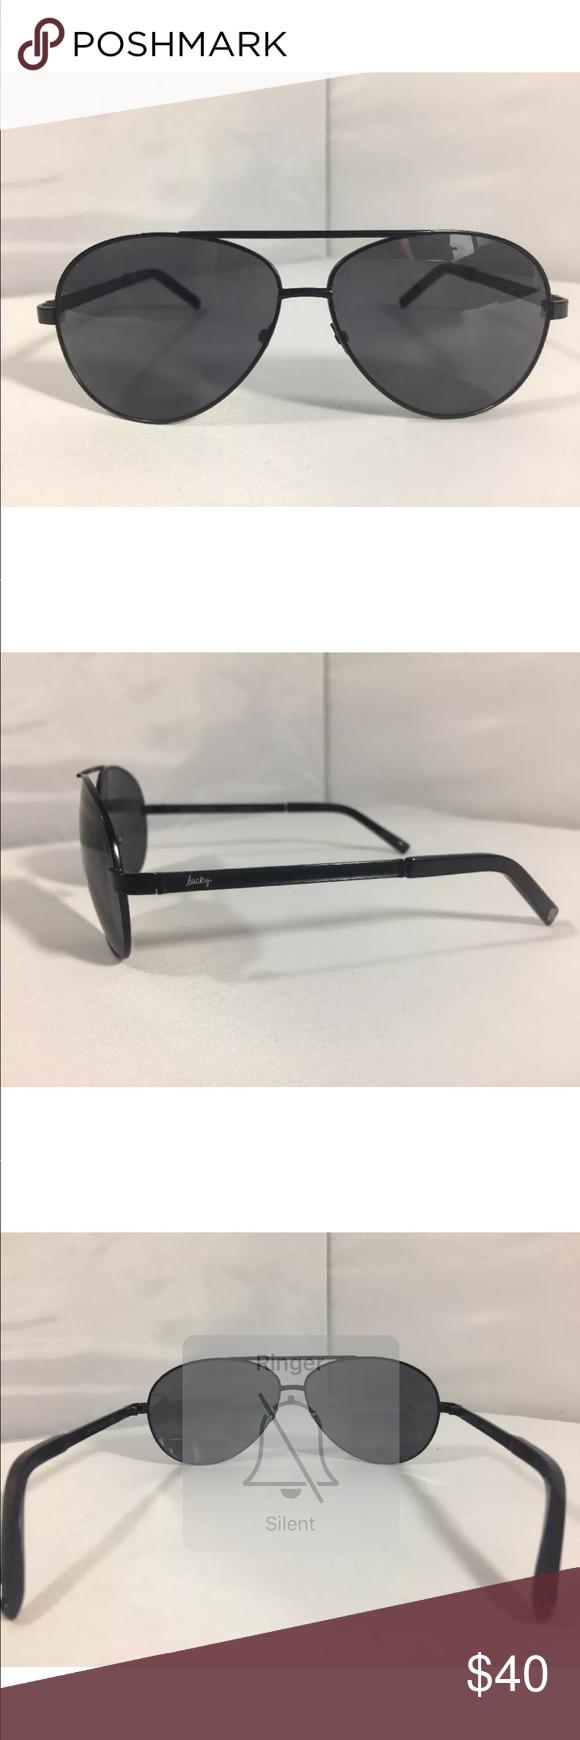 66835496fc Lucky Brand Aviator Sunglasses Capitola 65-13-135 Lucky Brand Aviator  Sunglasses Capitola 65-13-135 Black Lucky You Lucky Brand Accessories  Sunglasses